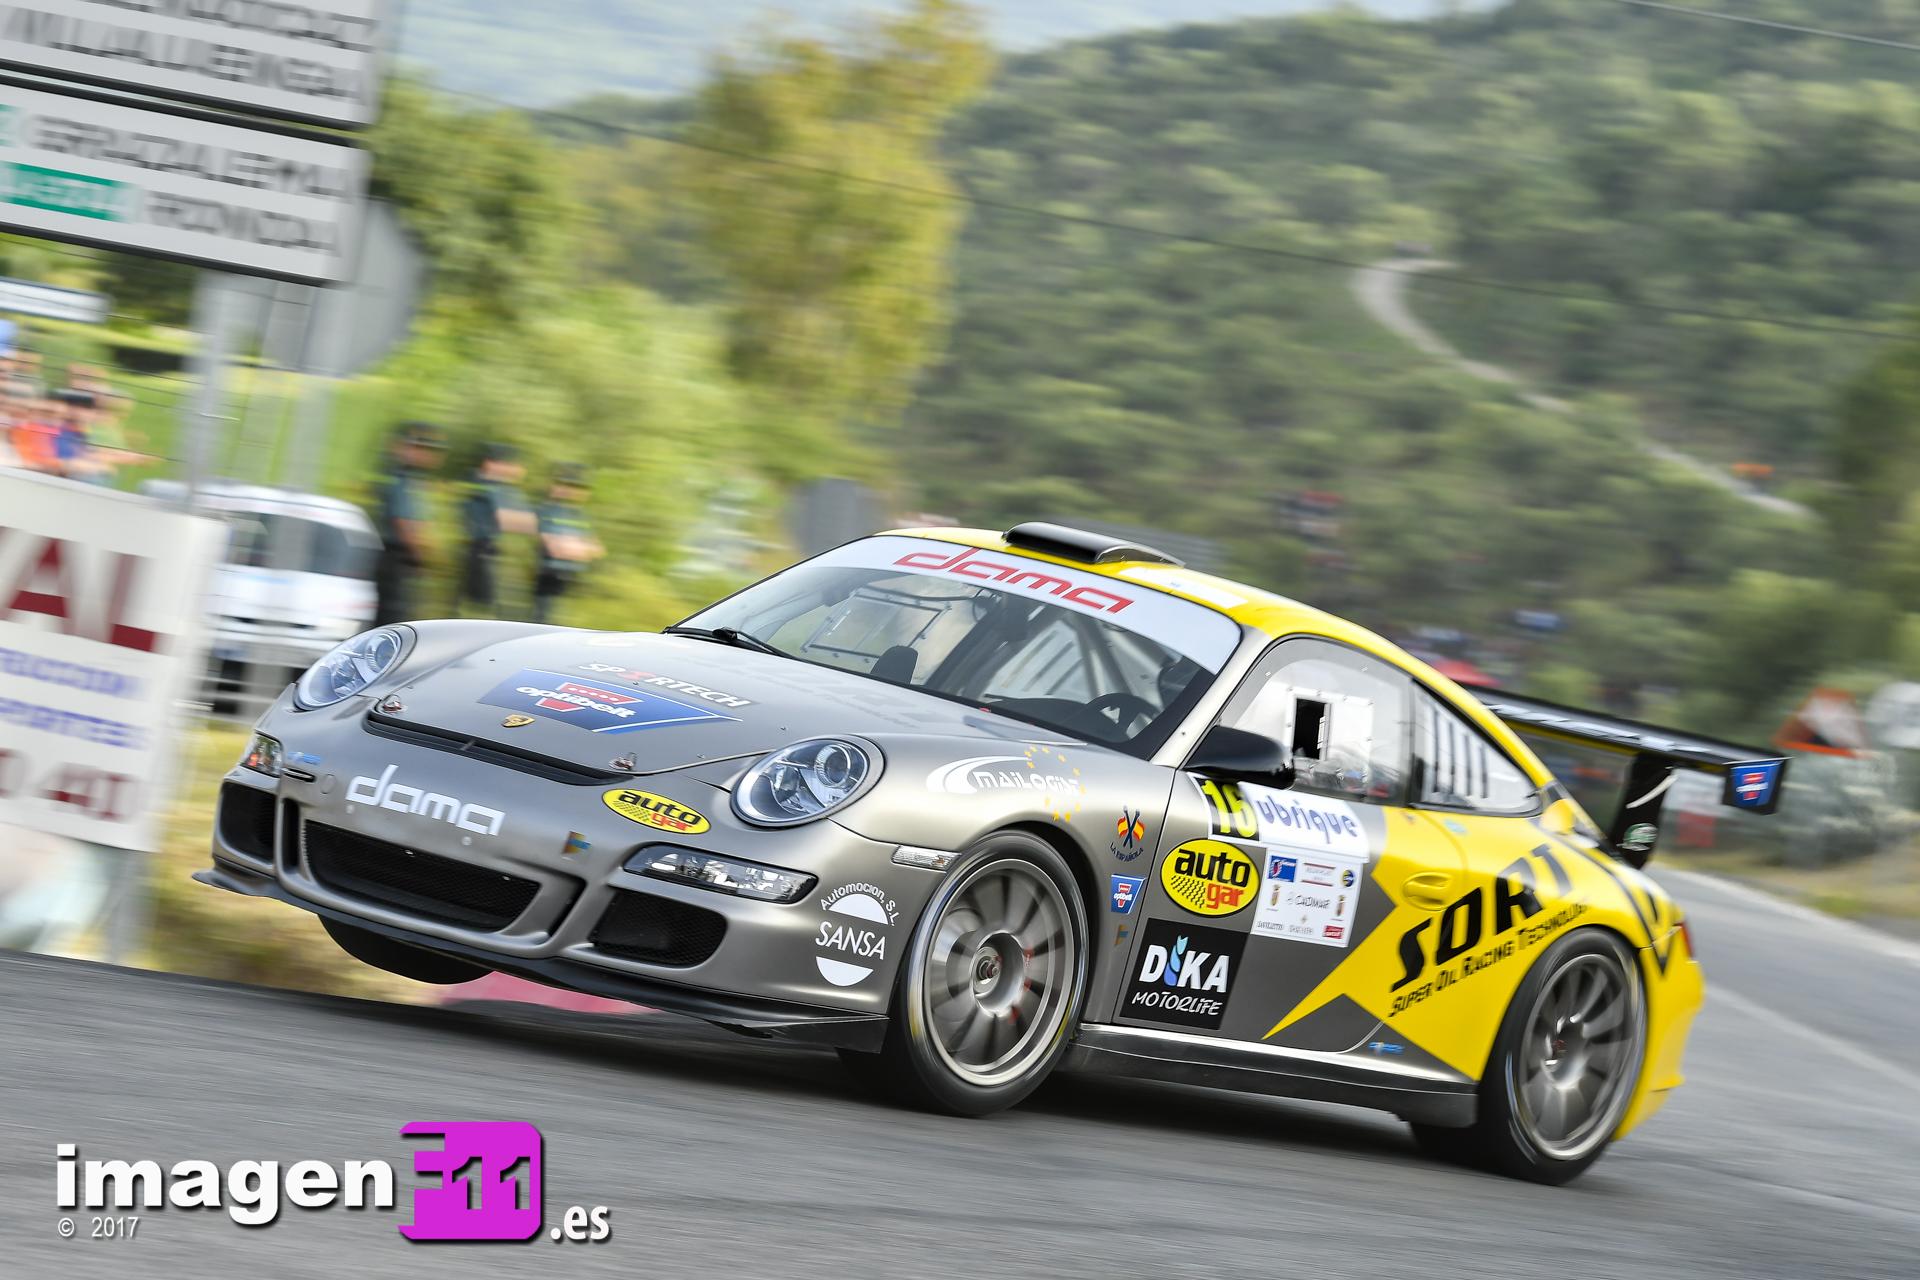 Manuel Maldonado, Porsche 911 GT3, Subida a Ubrique, Sort